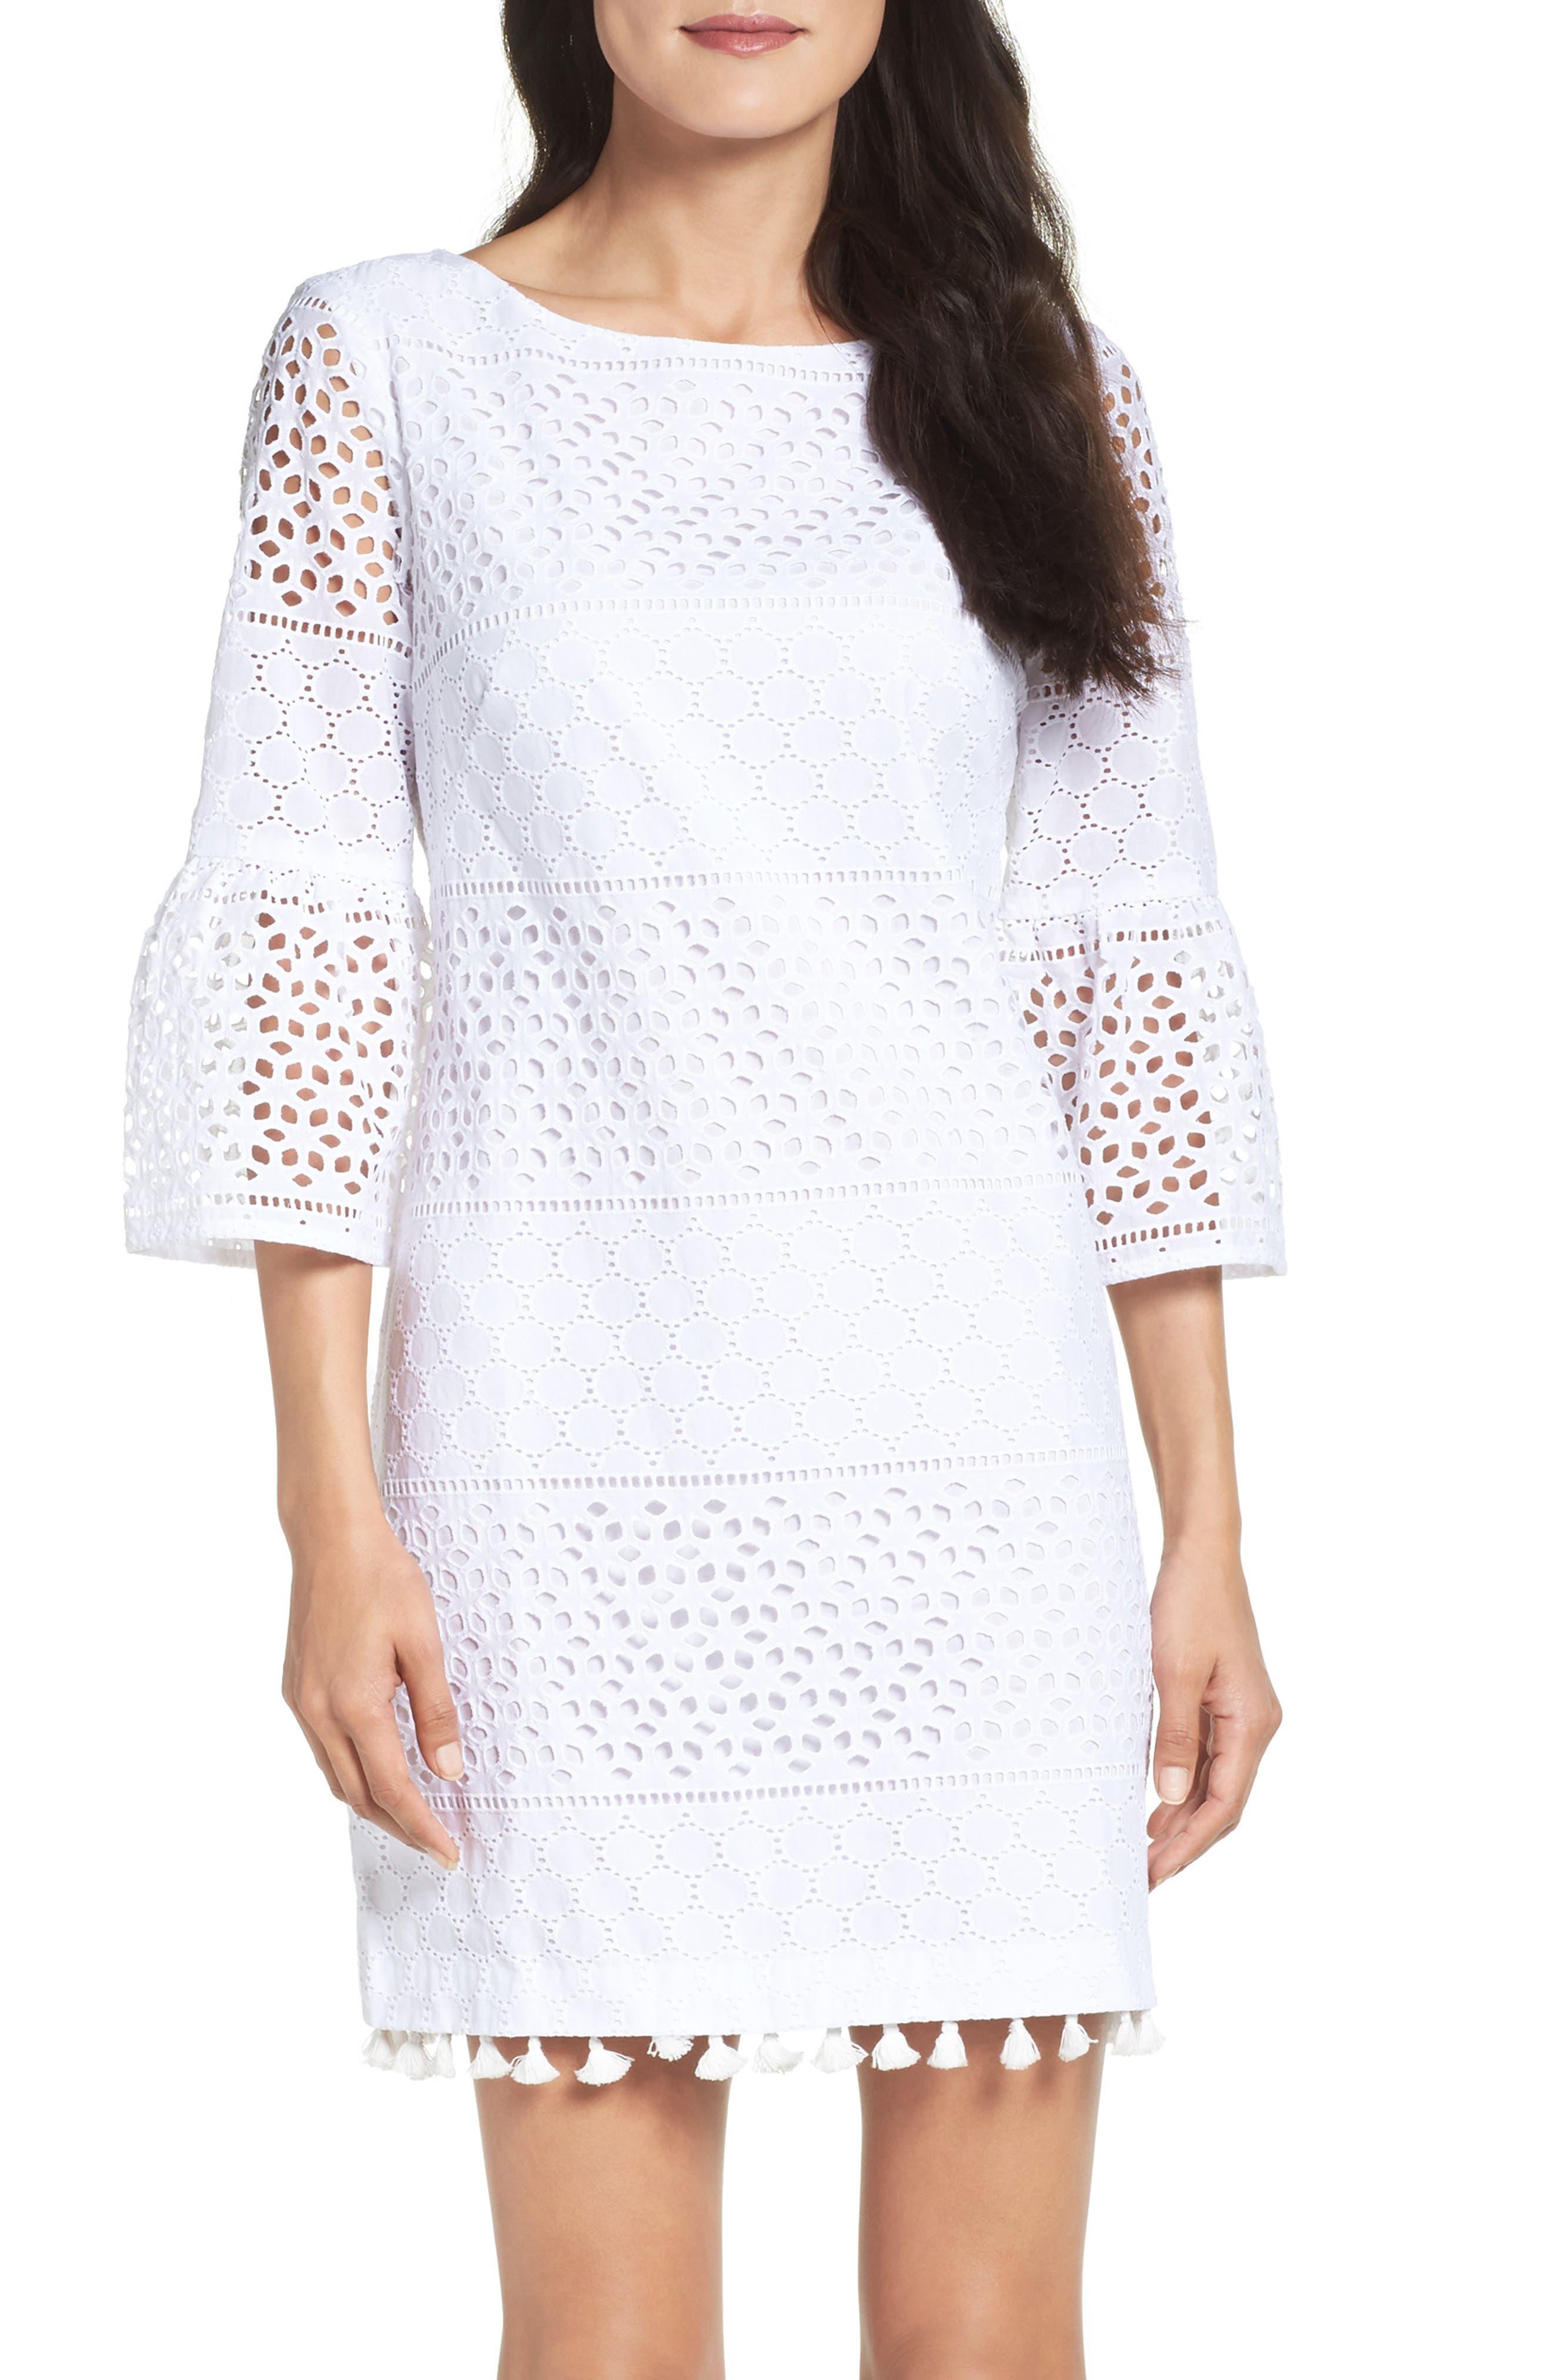 Alternate Image 1 Selected - Vince Camuto Eyelet A-Line Dress (Regular & Petite)